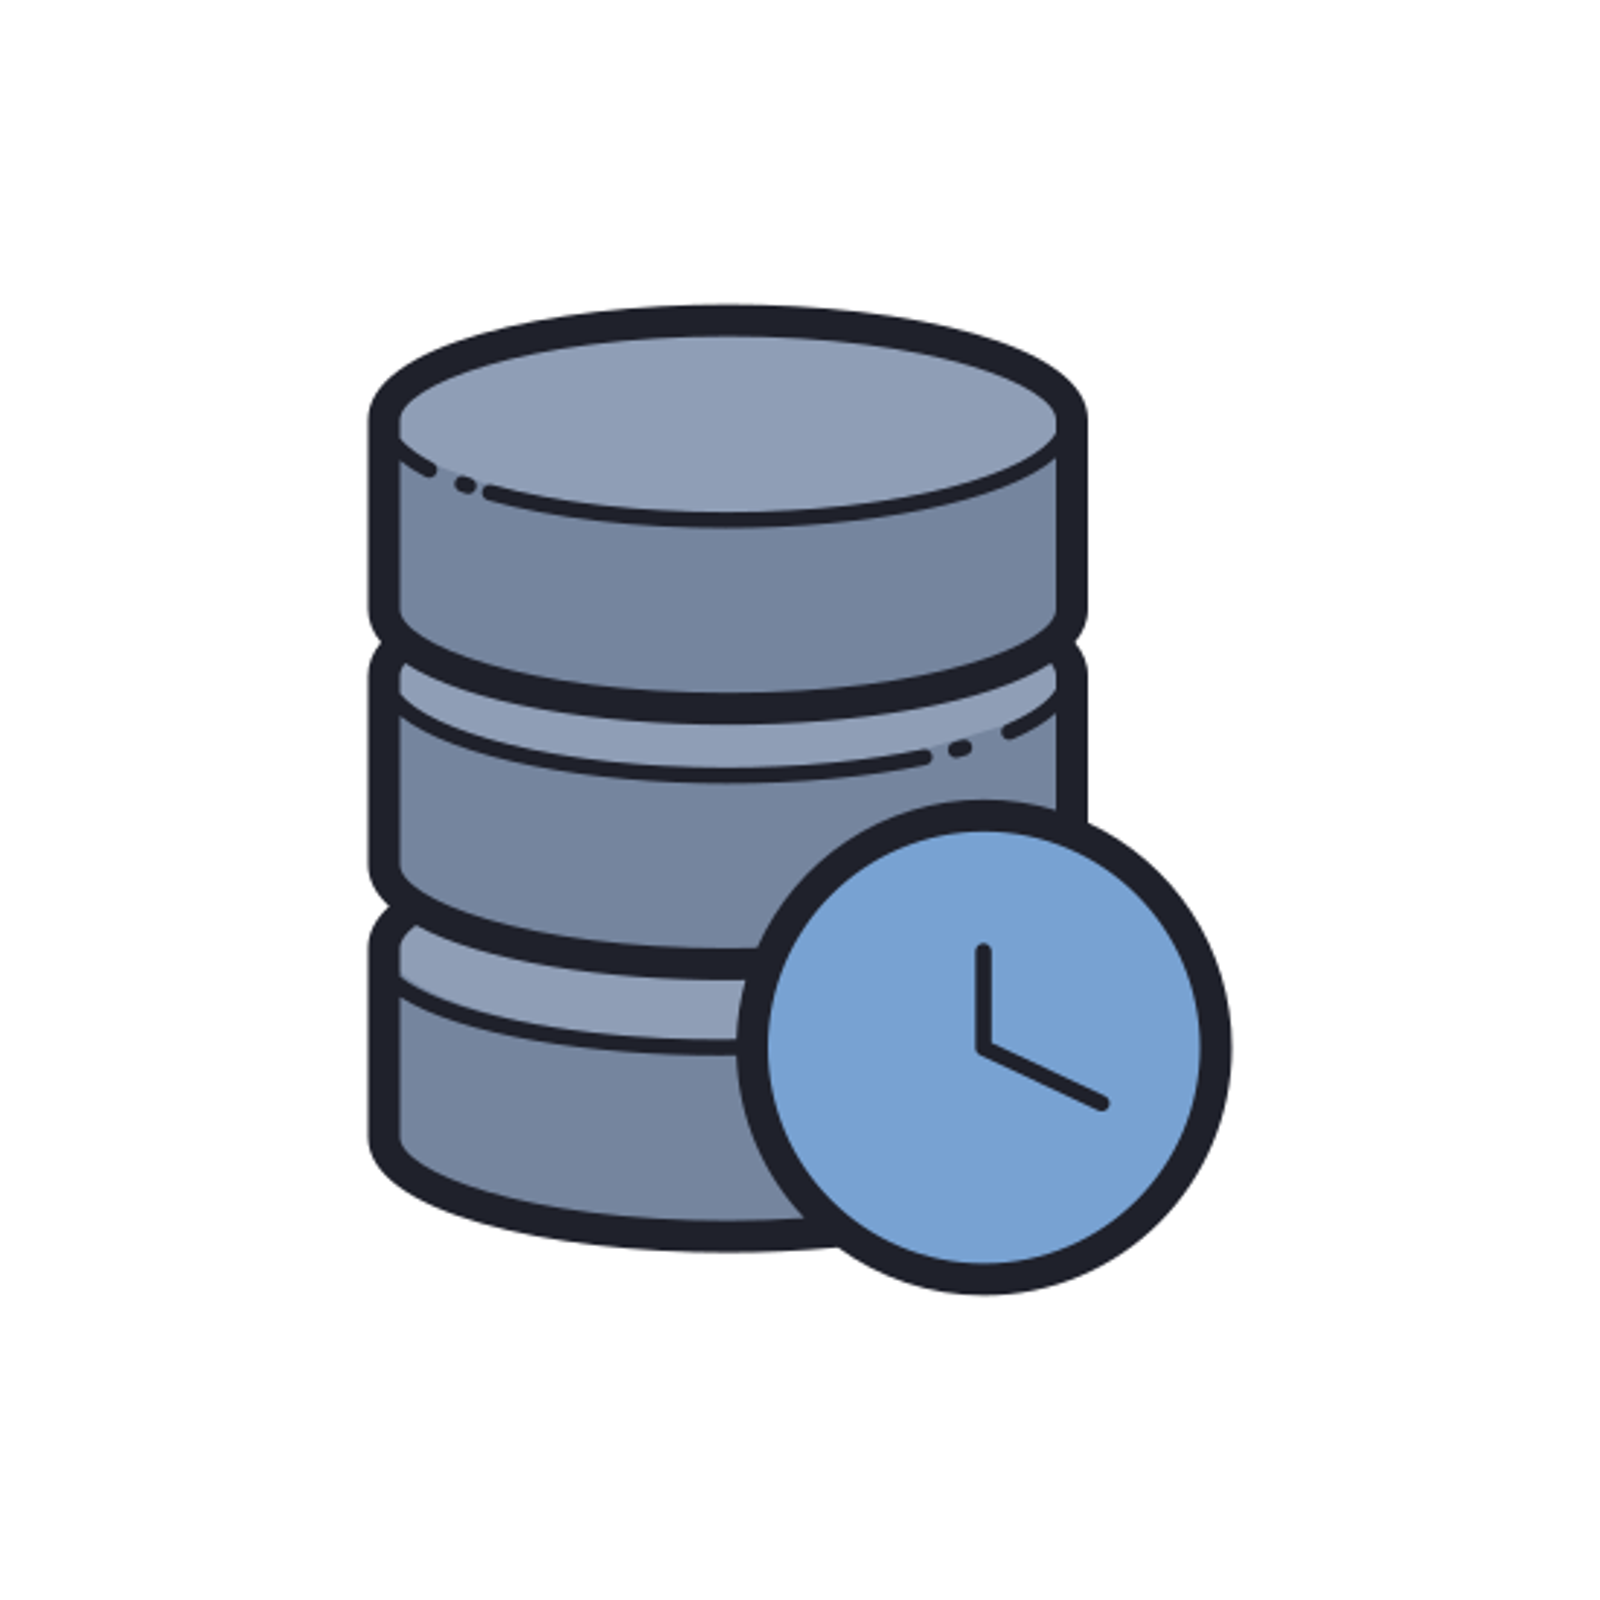 Server clocks and database icon